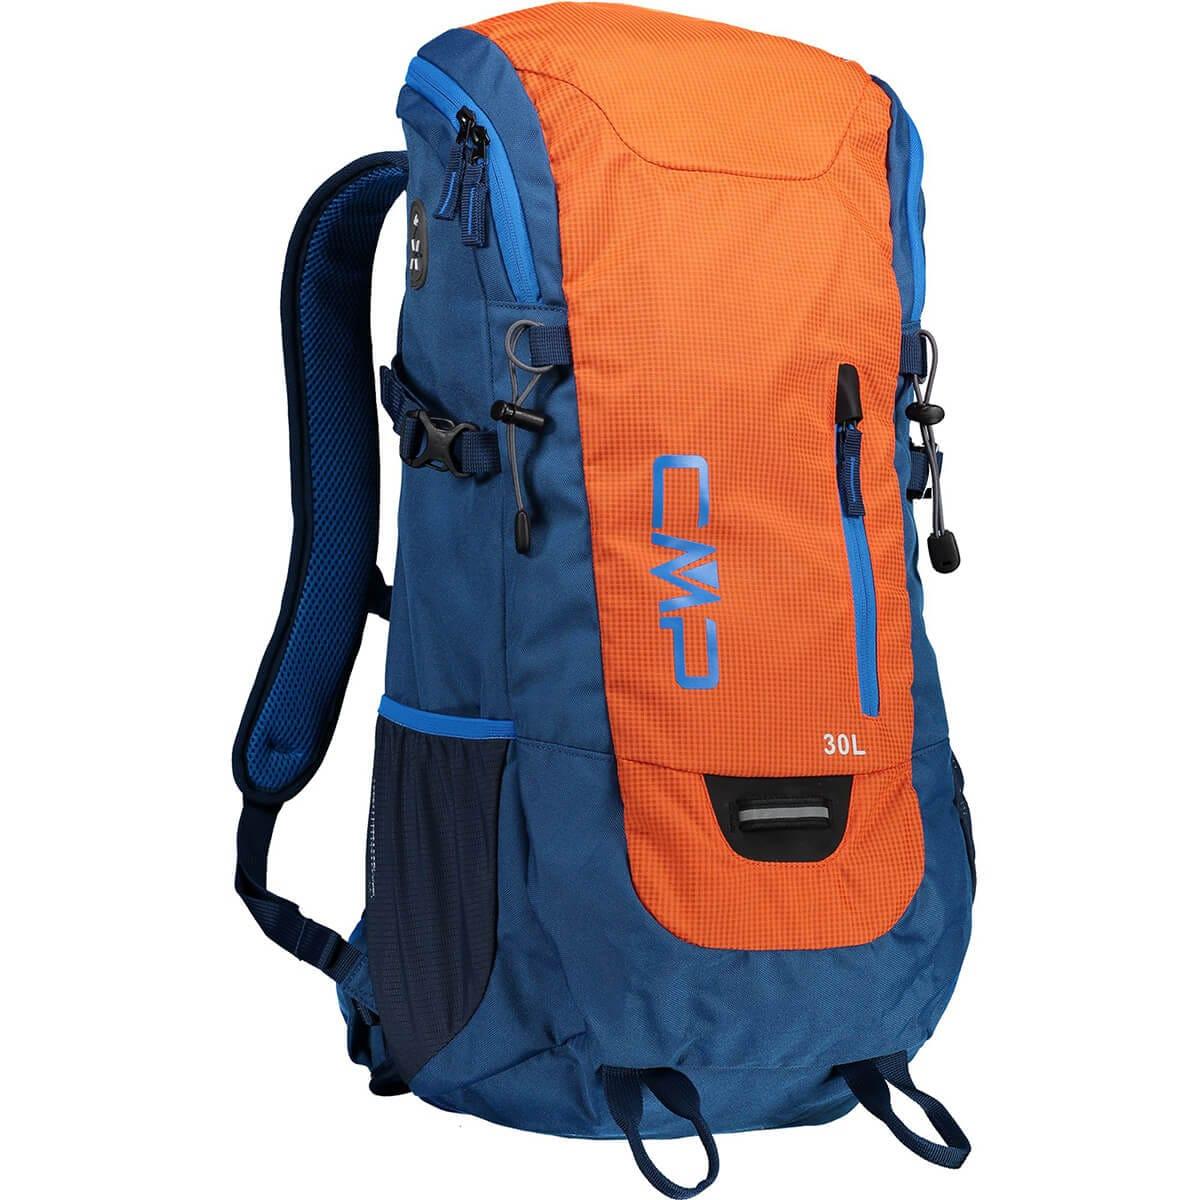 e16365524675d Plecak trekkingowy CMP HAYABUSA 30L - DeShop